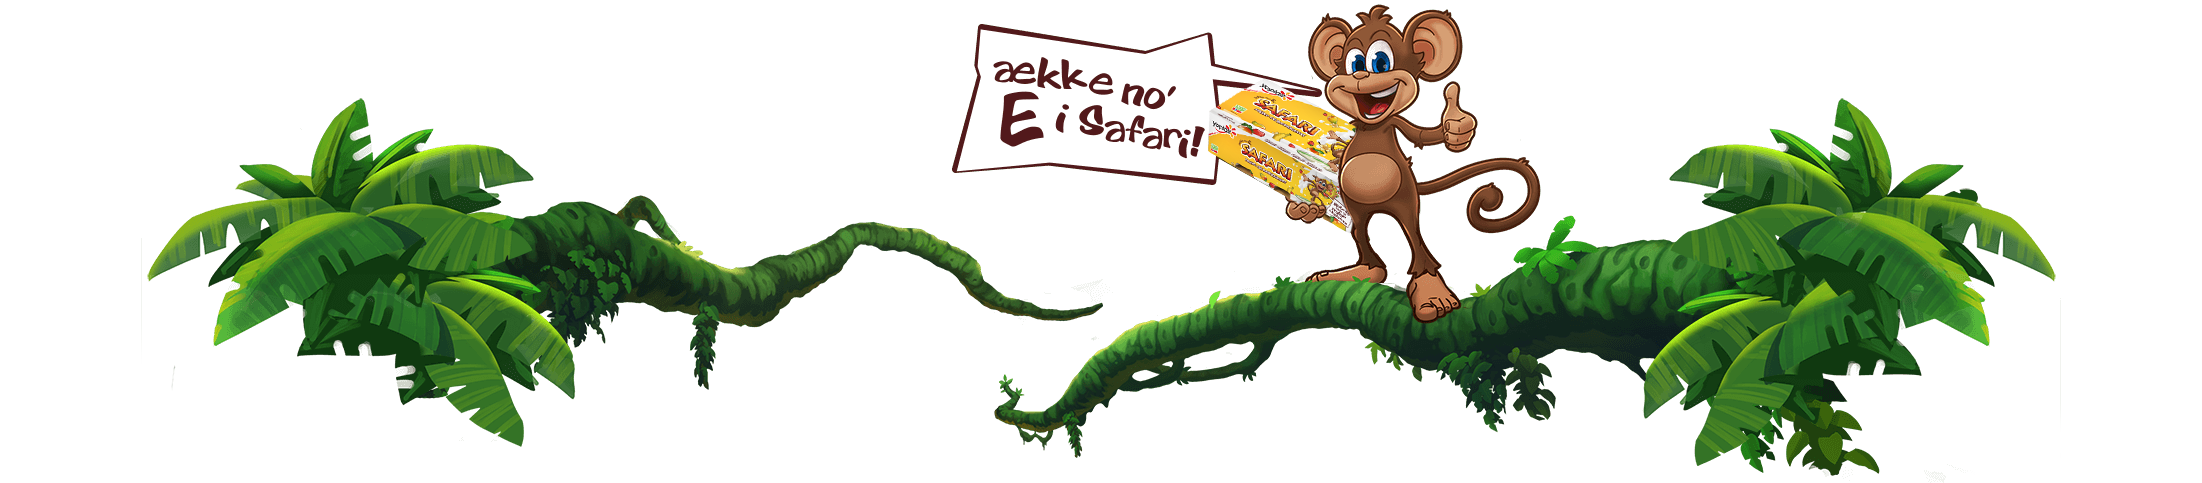 Safari-apen holde Safari-pakning